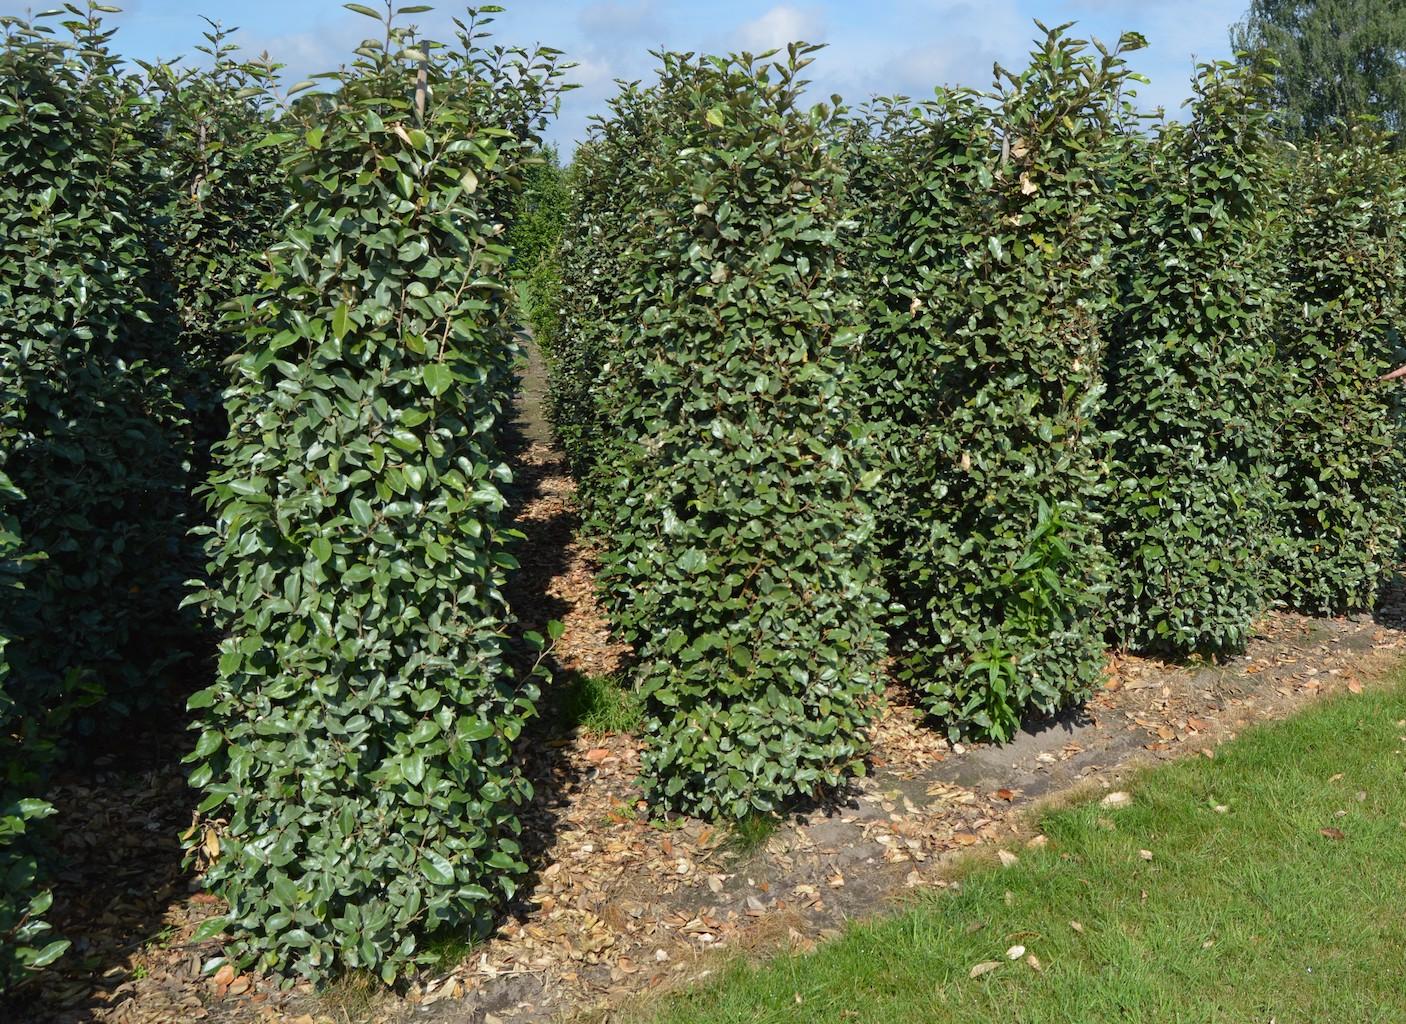 Eleagnus ebbingei hedge plants 175-200cm